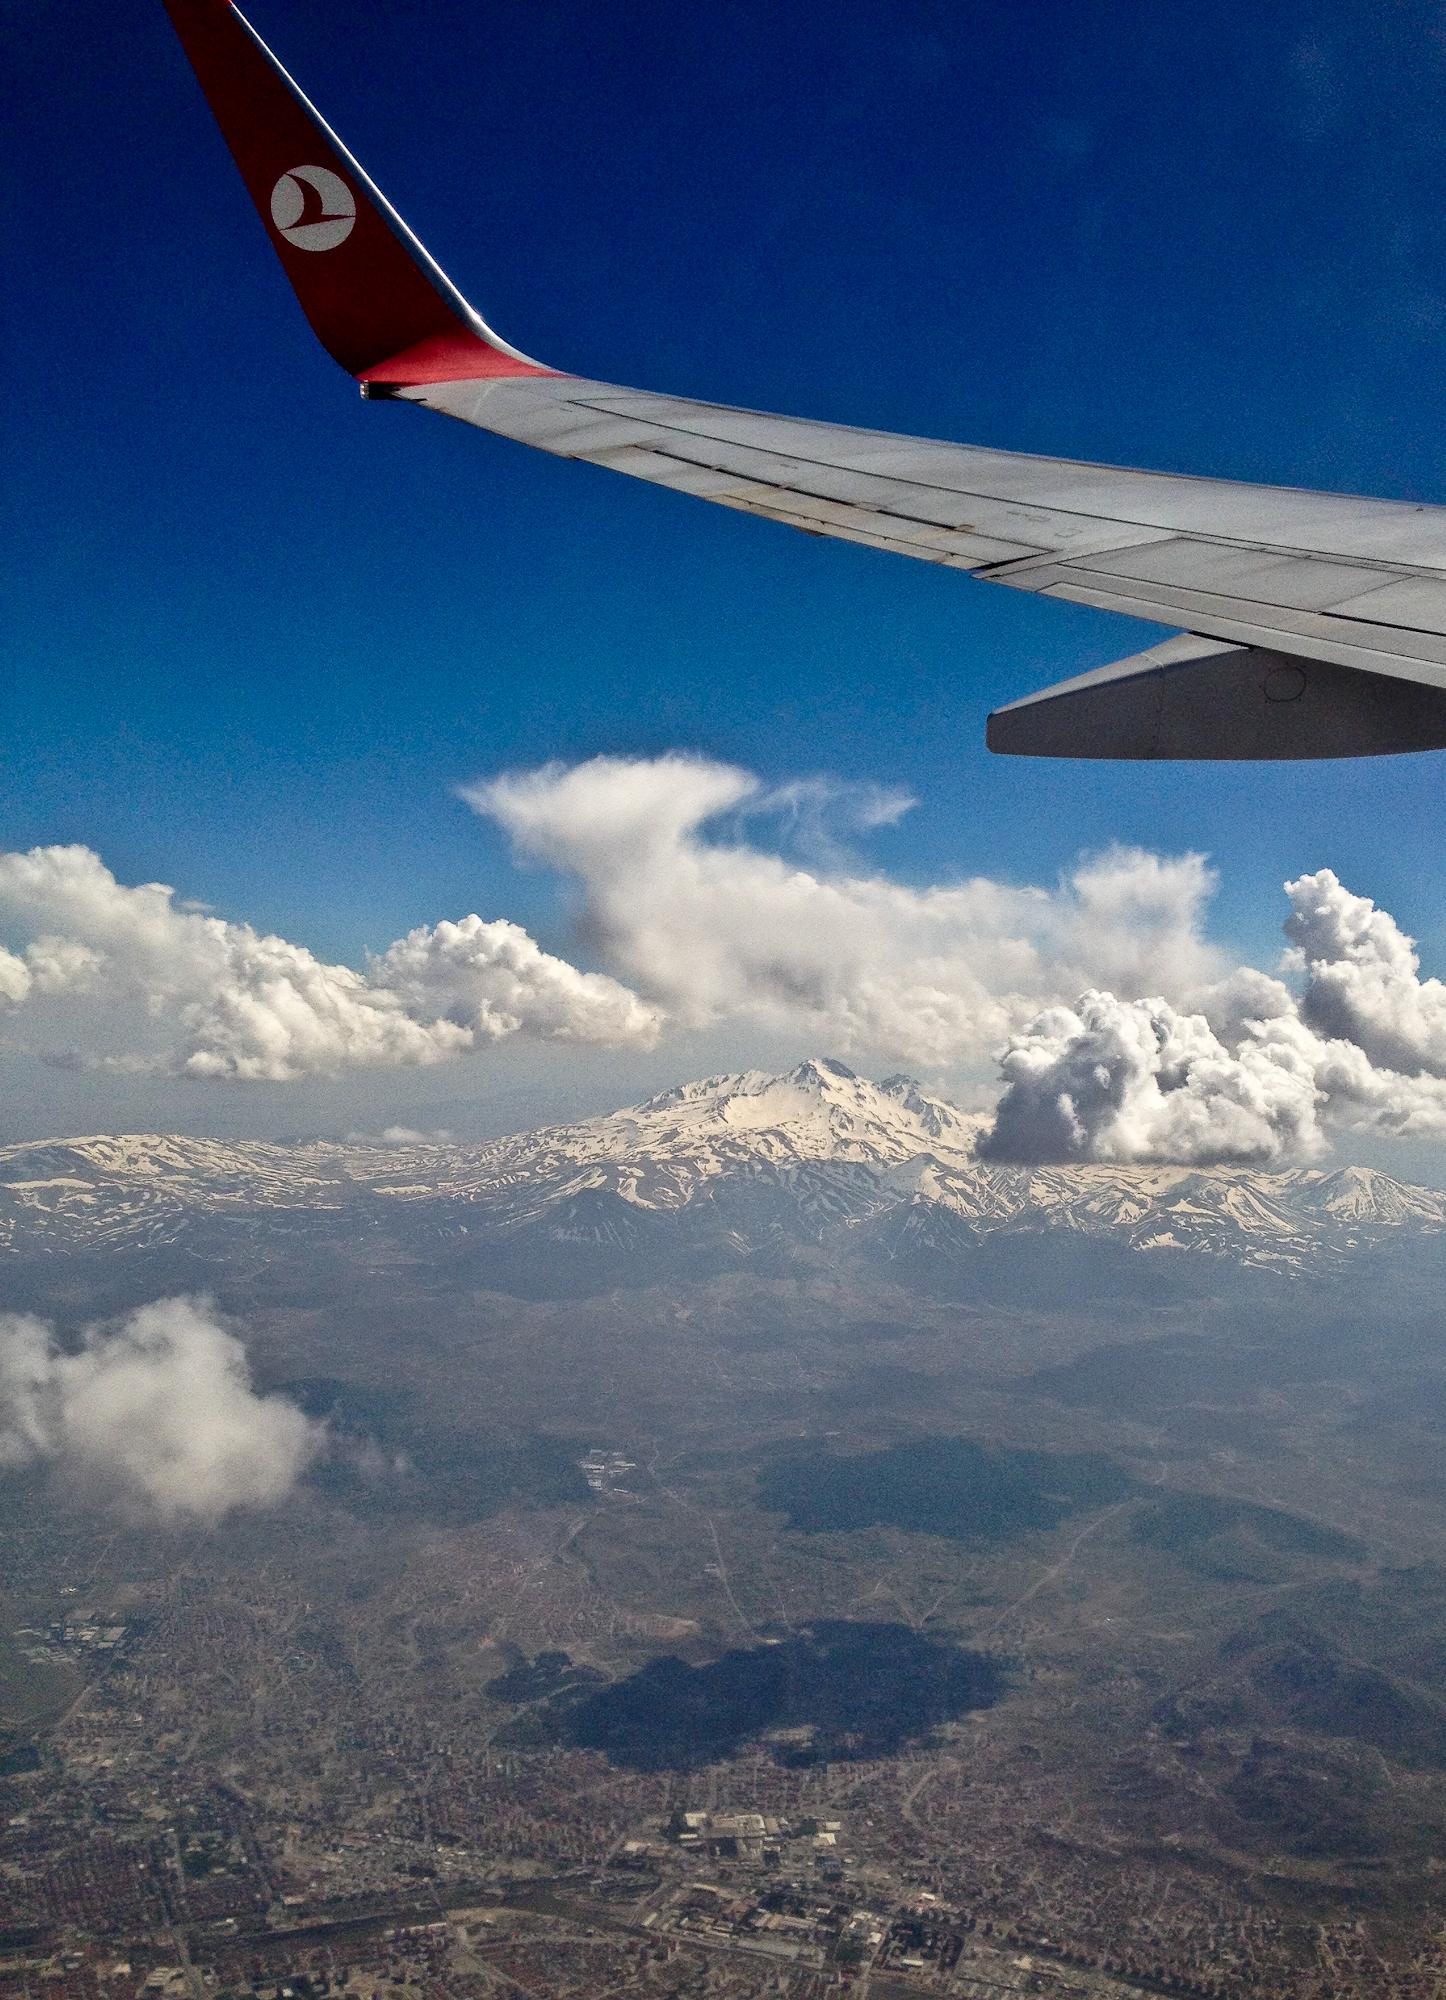 Capadocia-Aterizare in Kayseri la poalele lui Erciyes Dagi